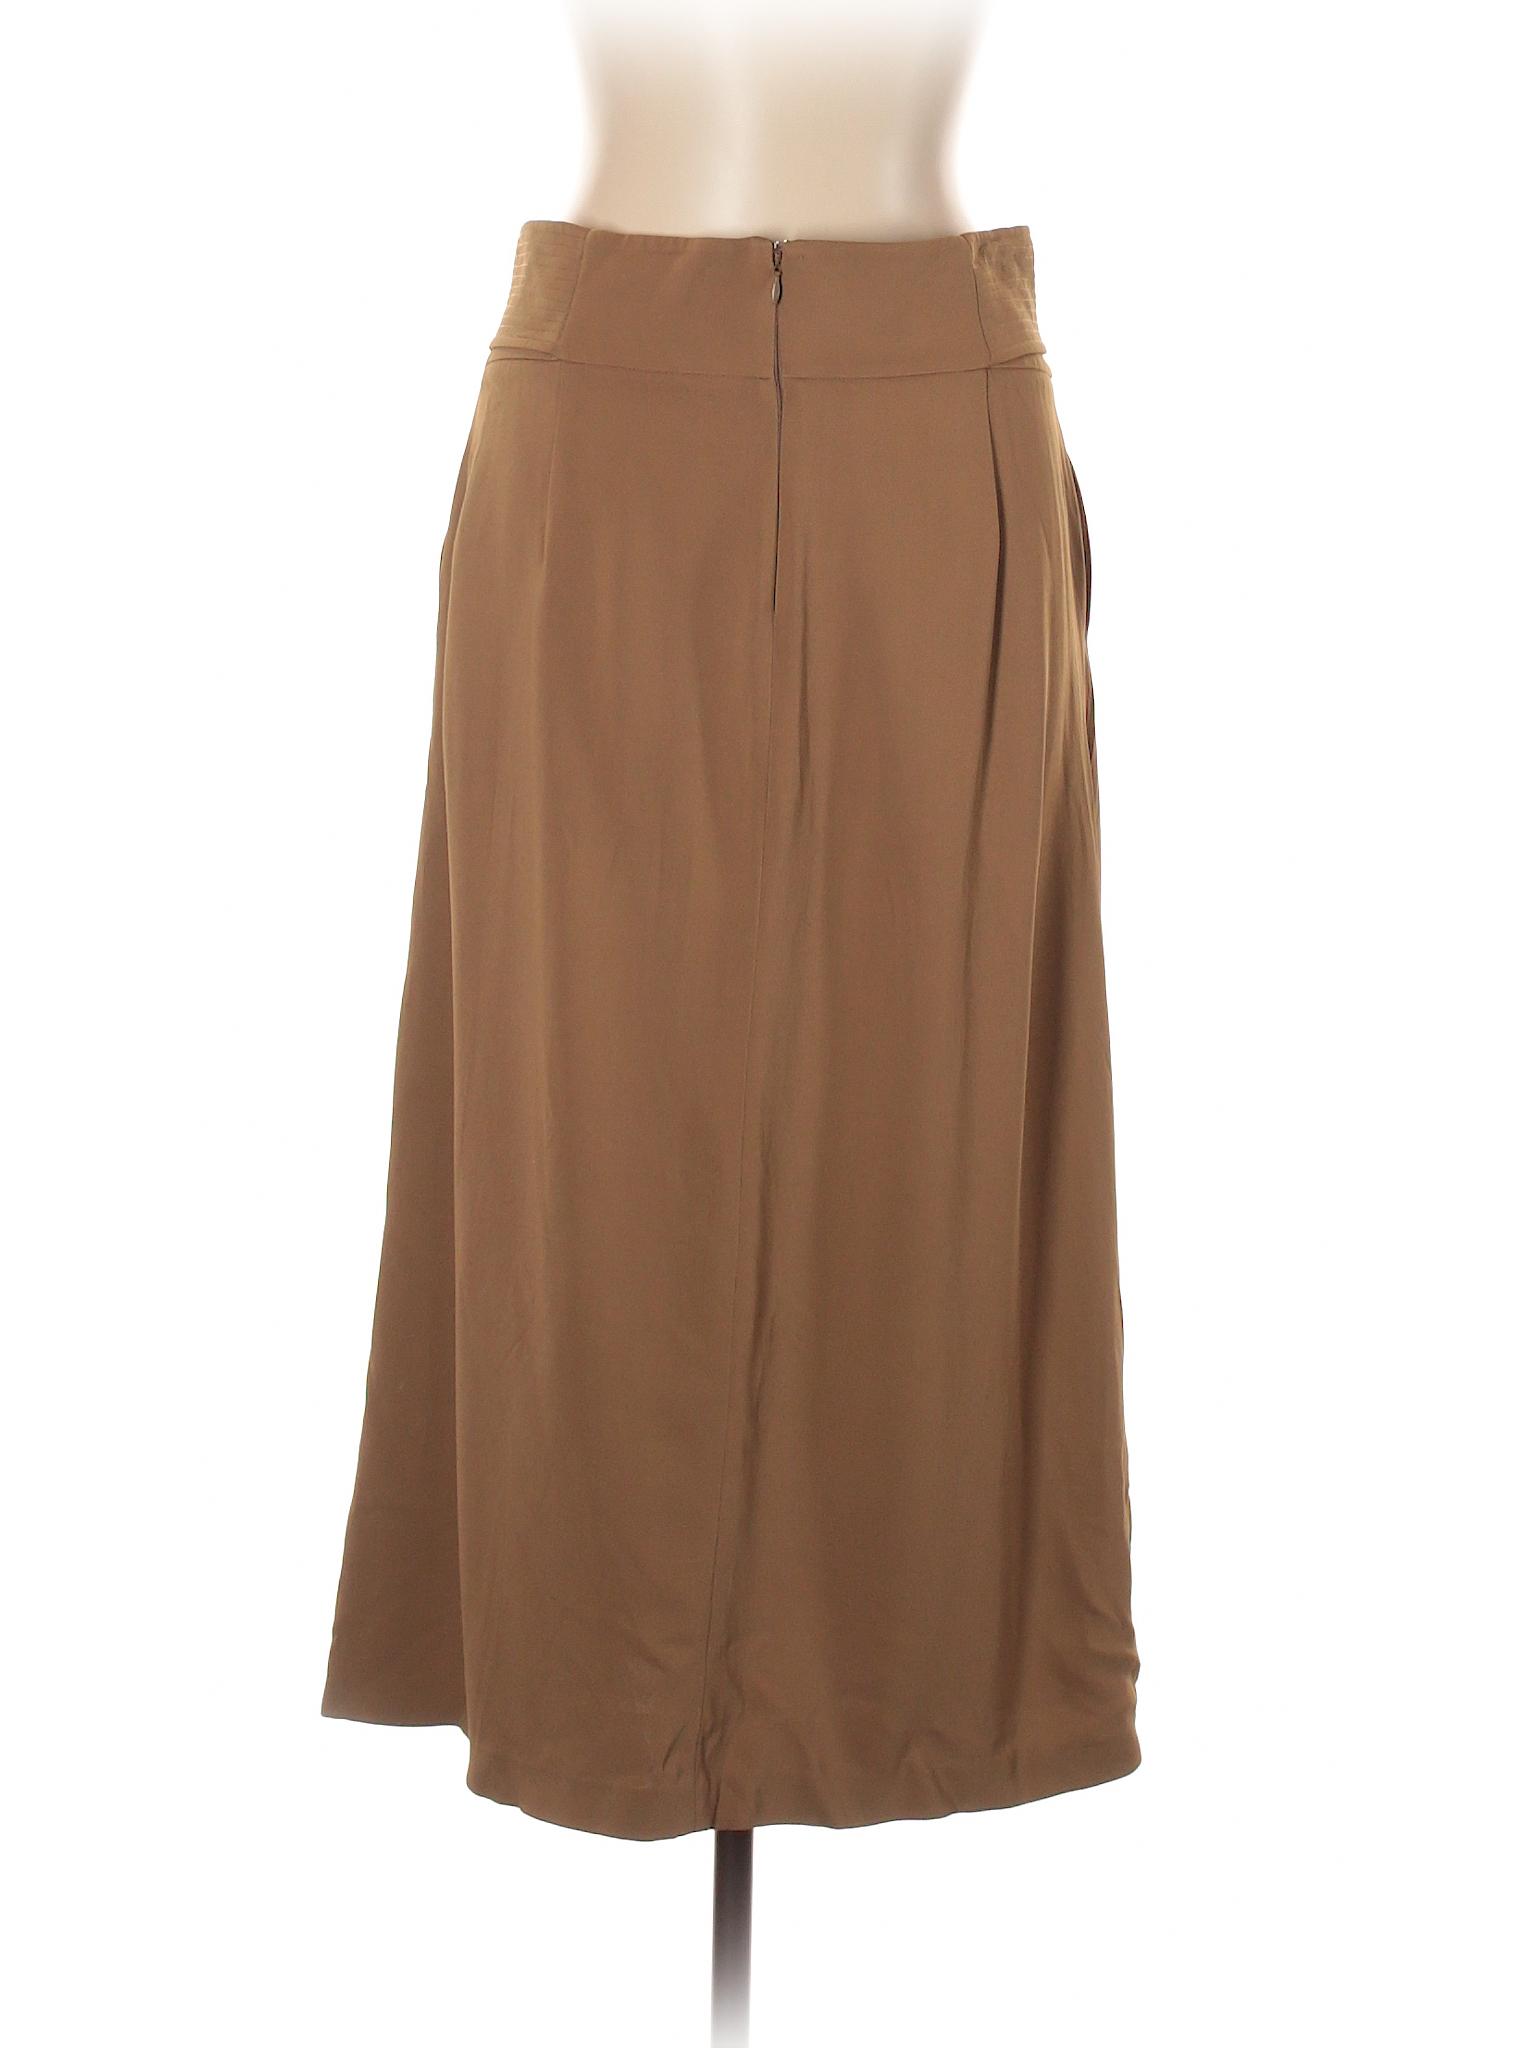 Casual Casual Casual Boutique Boutique Boutique Skirt Skirt Skirt Casual Boutique qBxpxaE